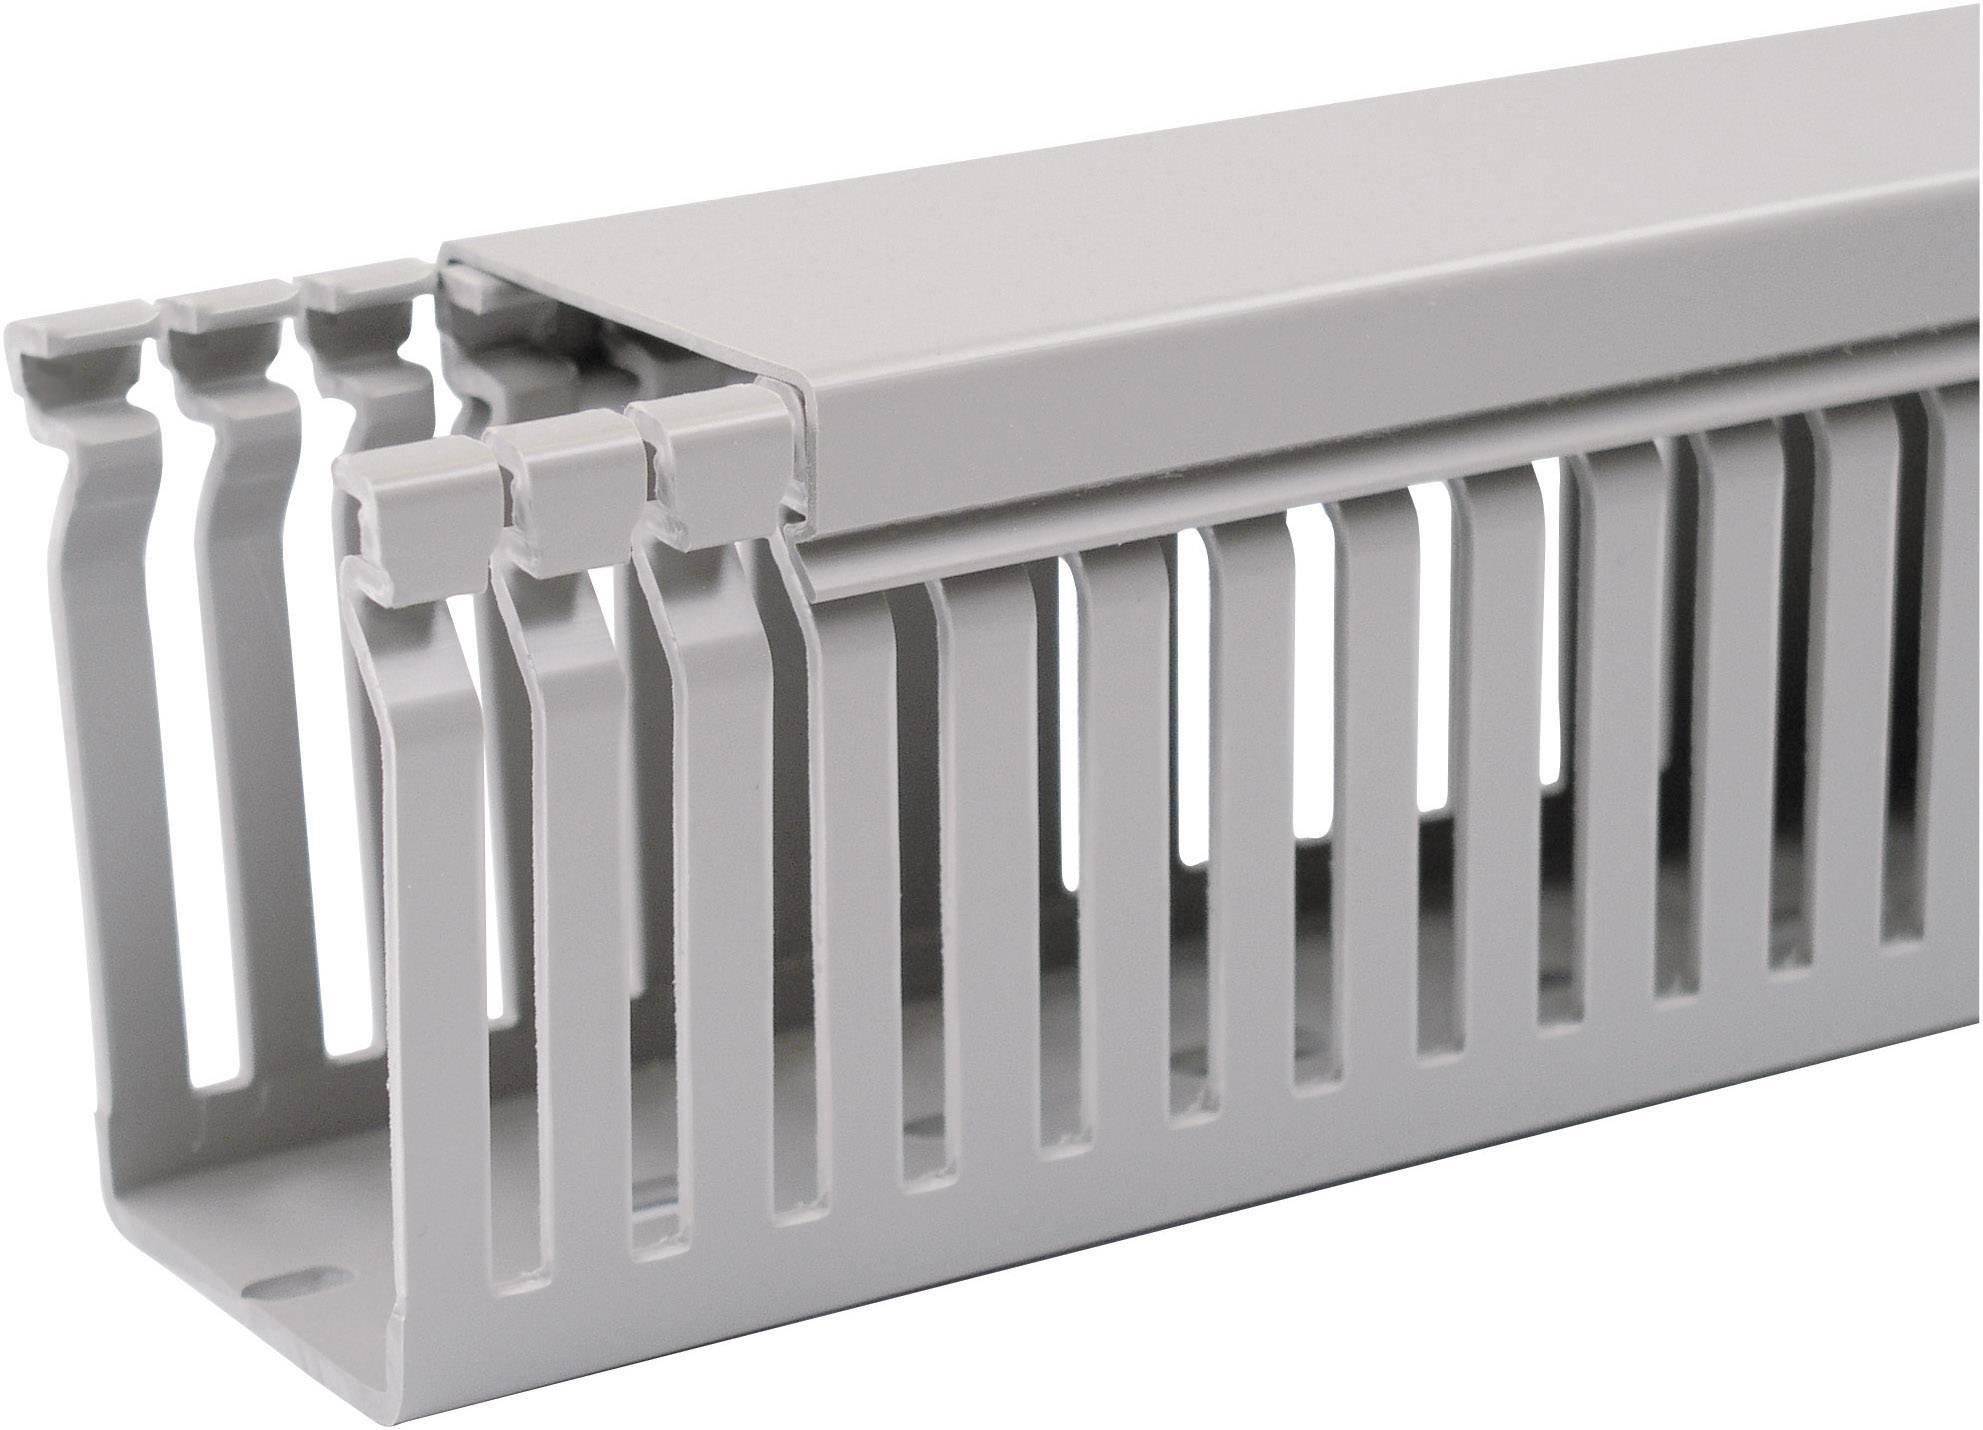 Elektroinstalační lišta OBO Bettermann, 6178033, 60 x 60 mm, 2 m, šedá